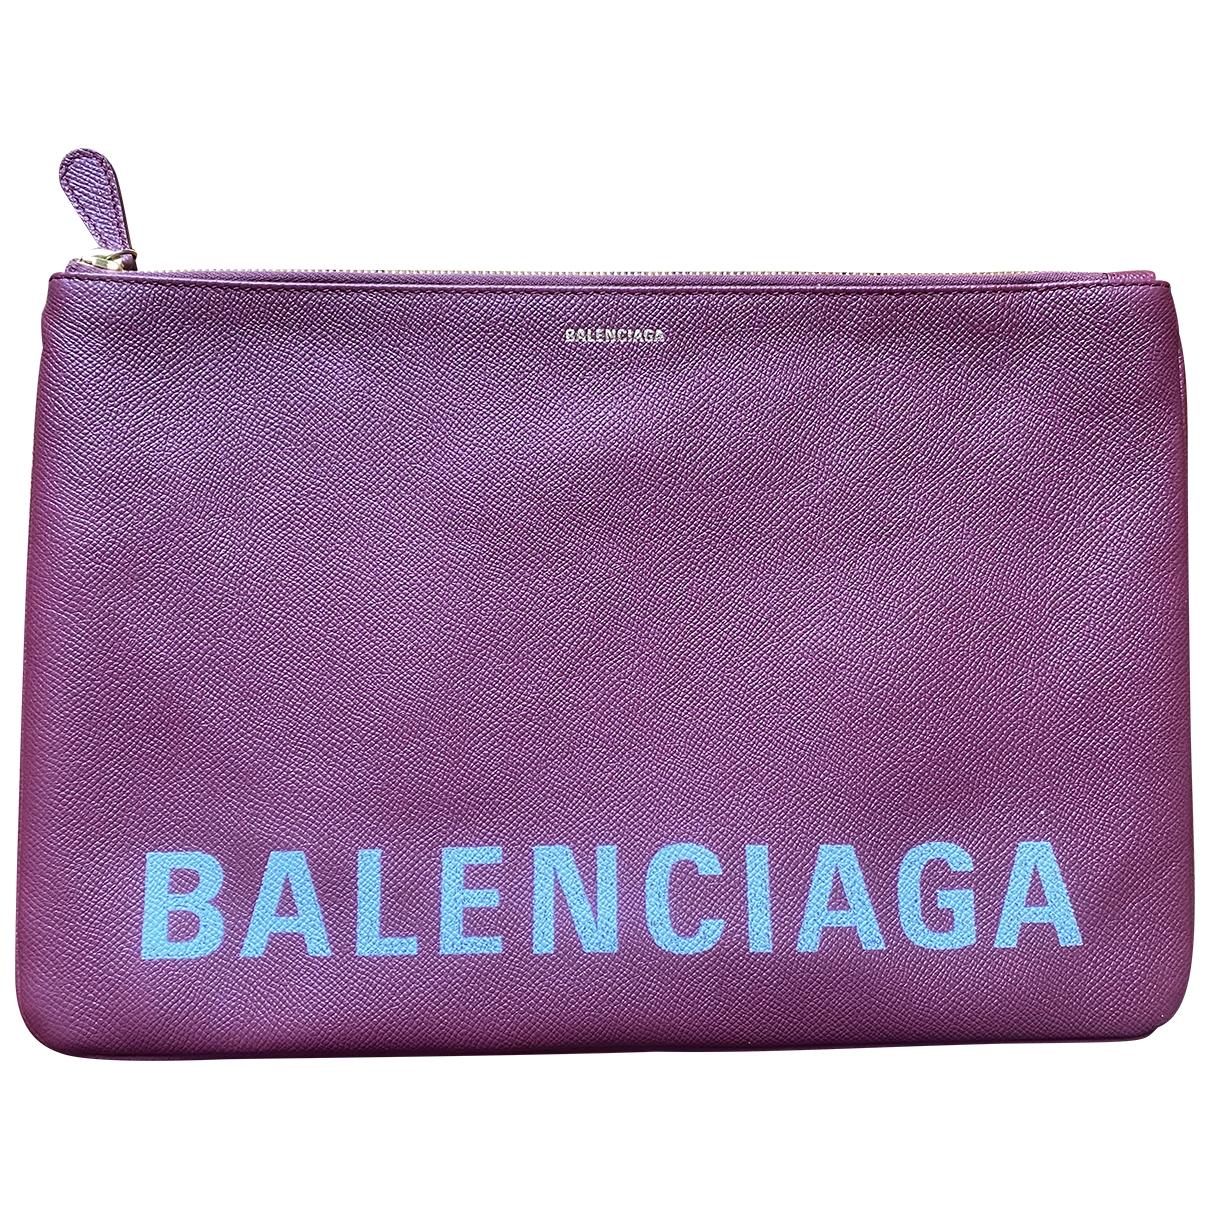 Balenciaga Everyday Clutch in  Bordeauxrot Leder